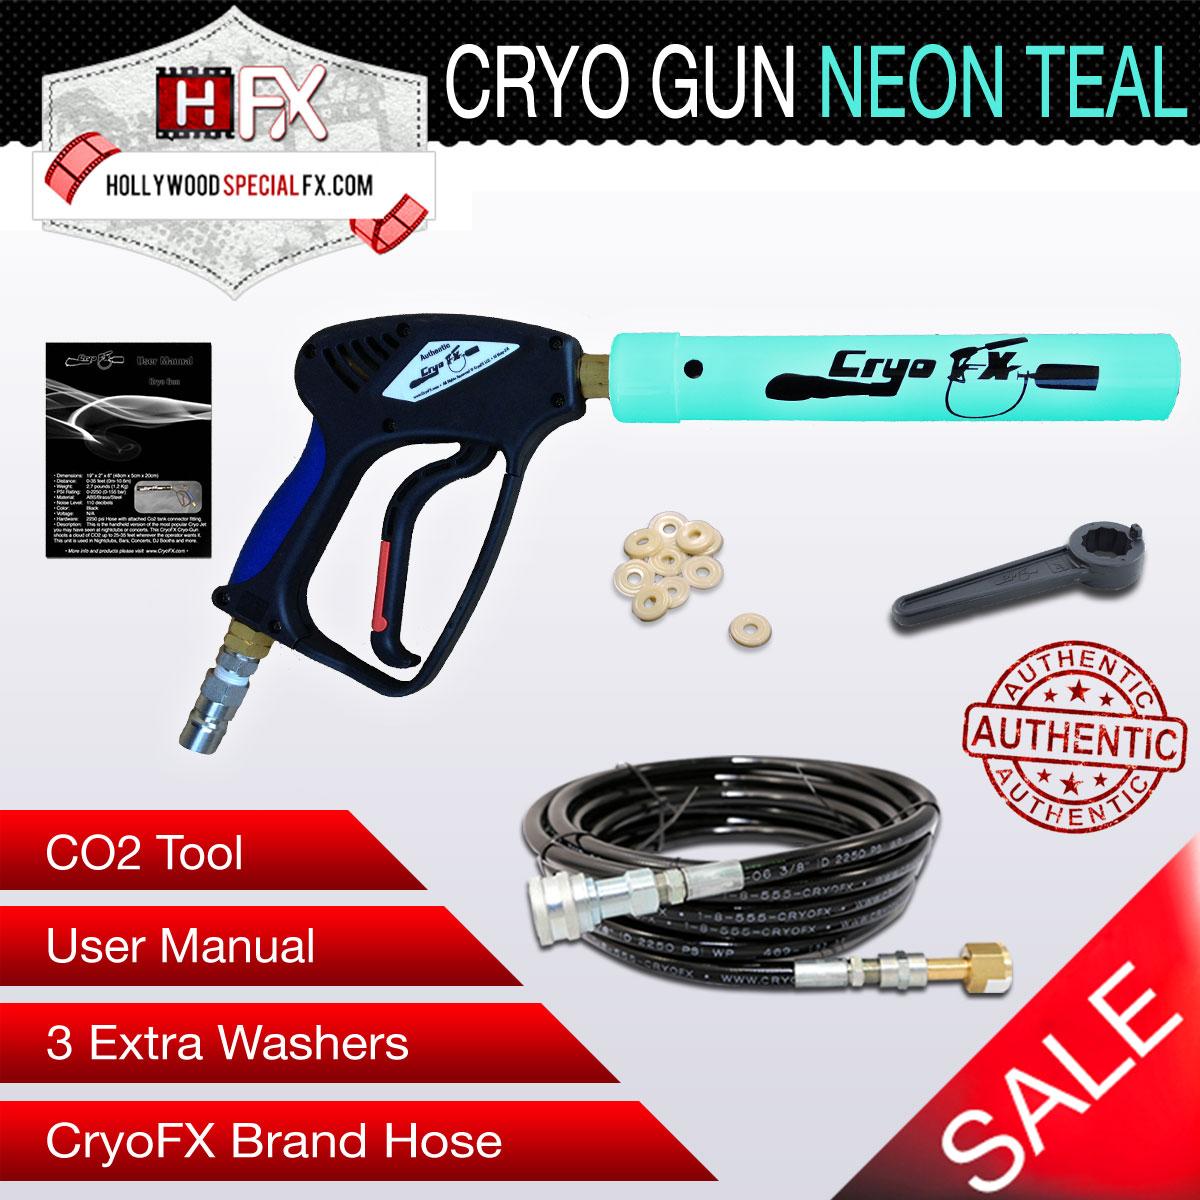 Cryo Gun NEON Teal